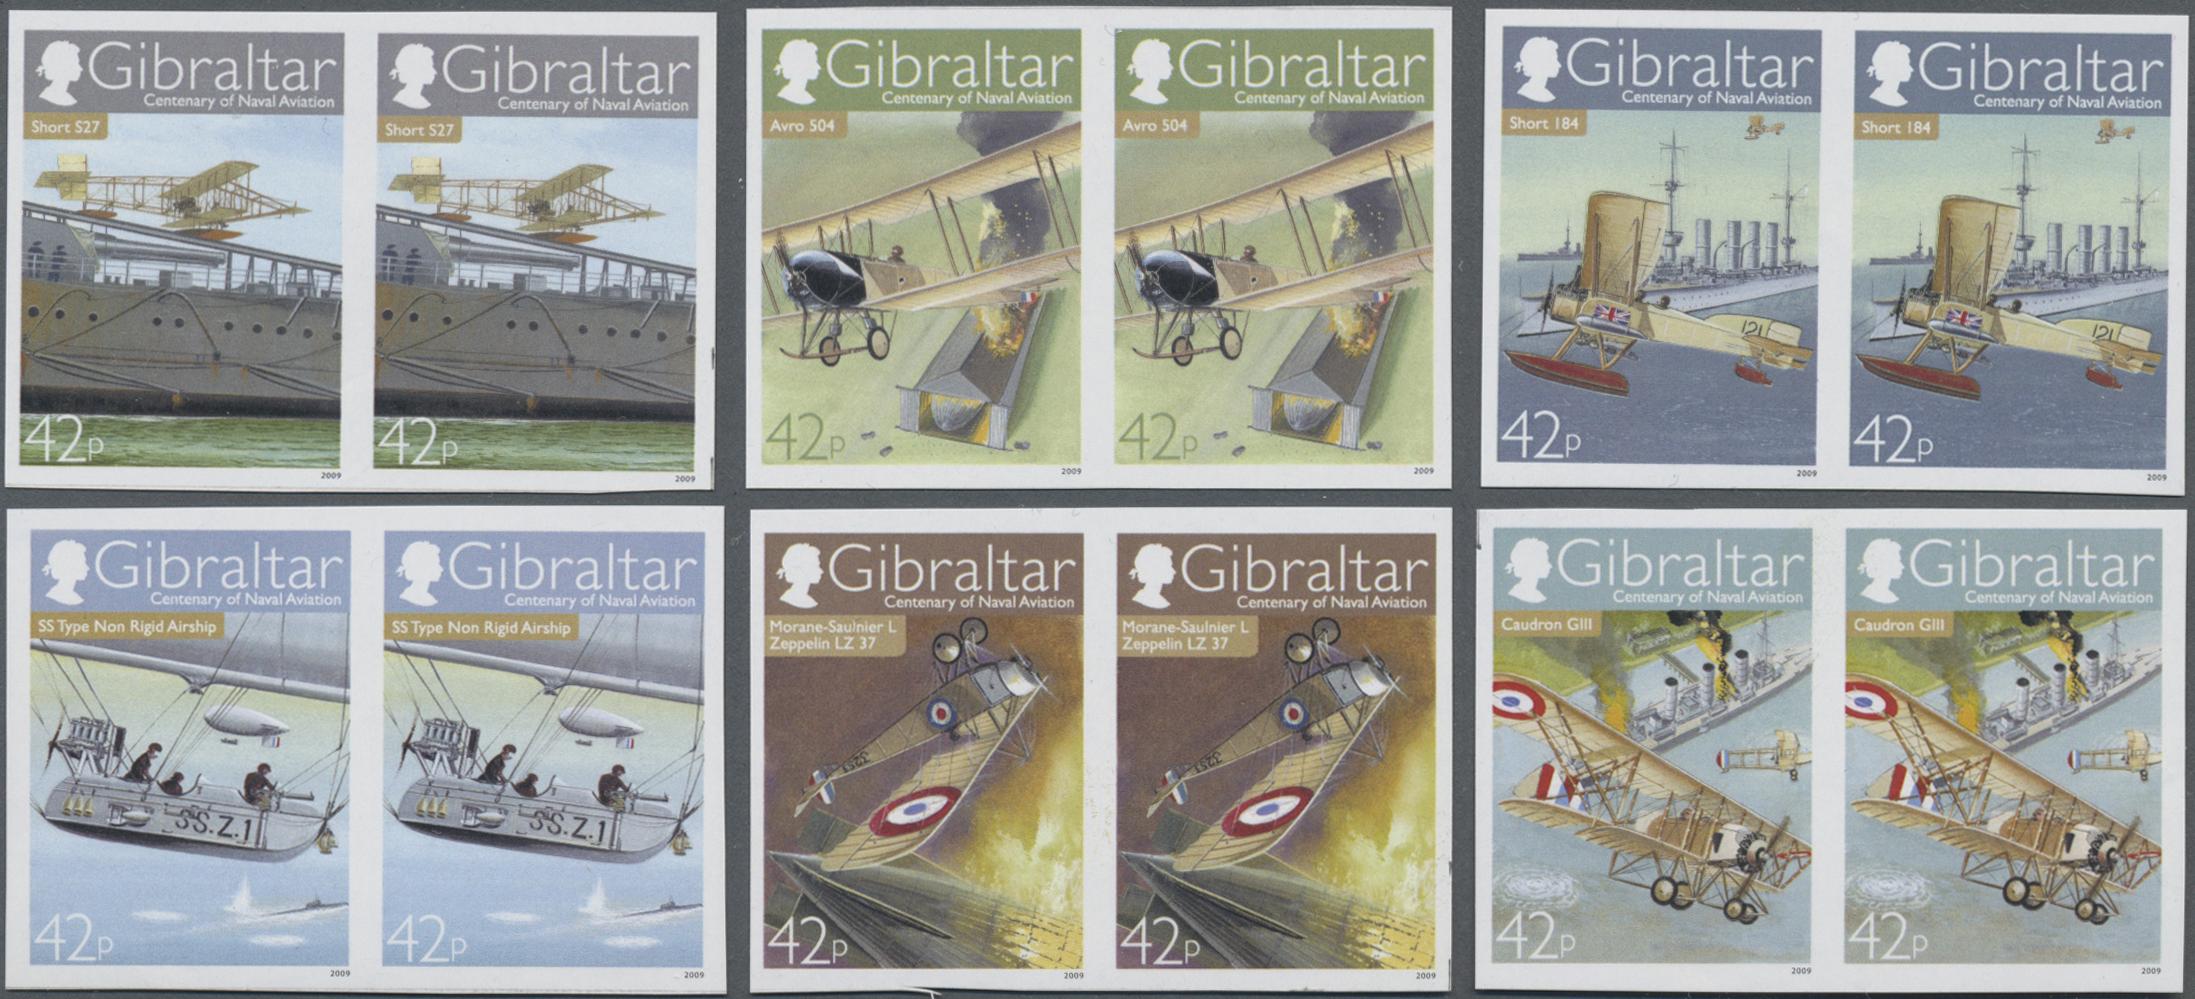 Lot 06218 - Thematik: Flugzeuge, Luftfahrt / airoplanes, aviation  -  Auktionshaus Christoph Gärtner GmbH & Co. KG Sale #48 The Single Lots Philatelie